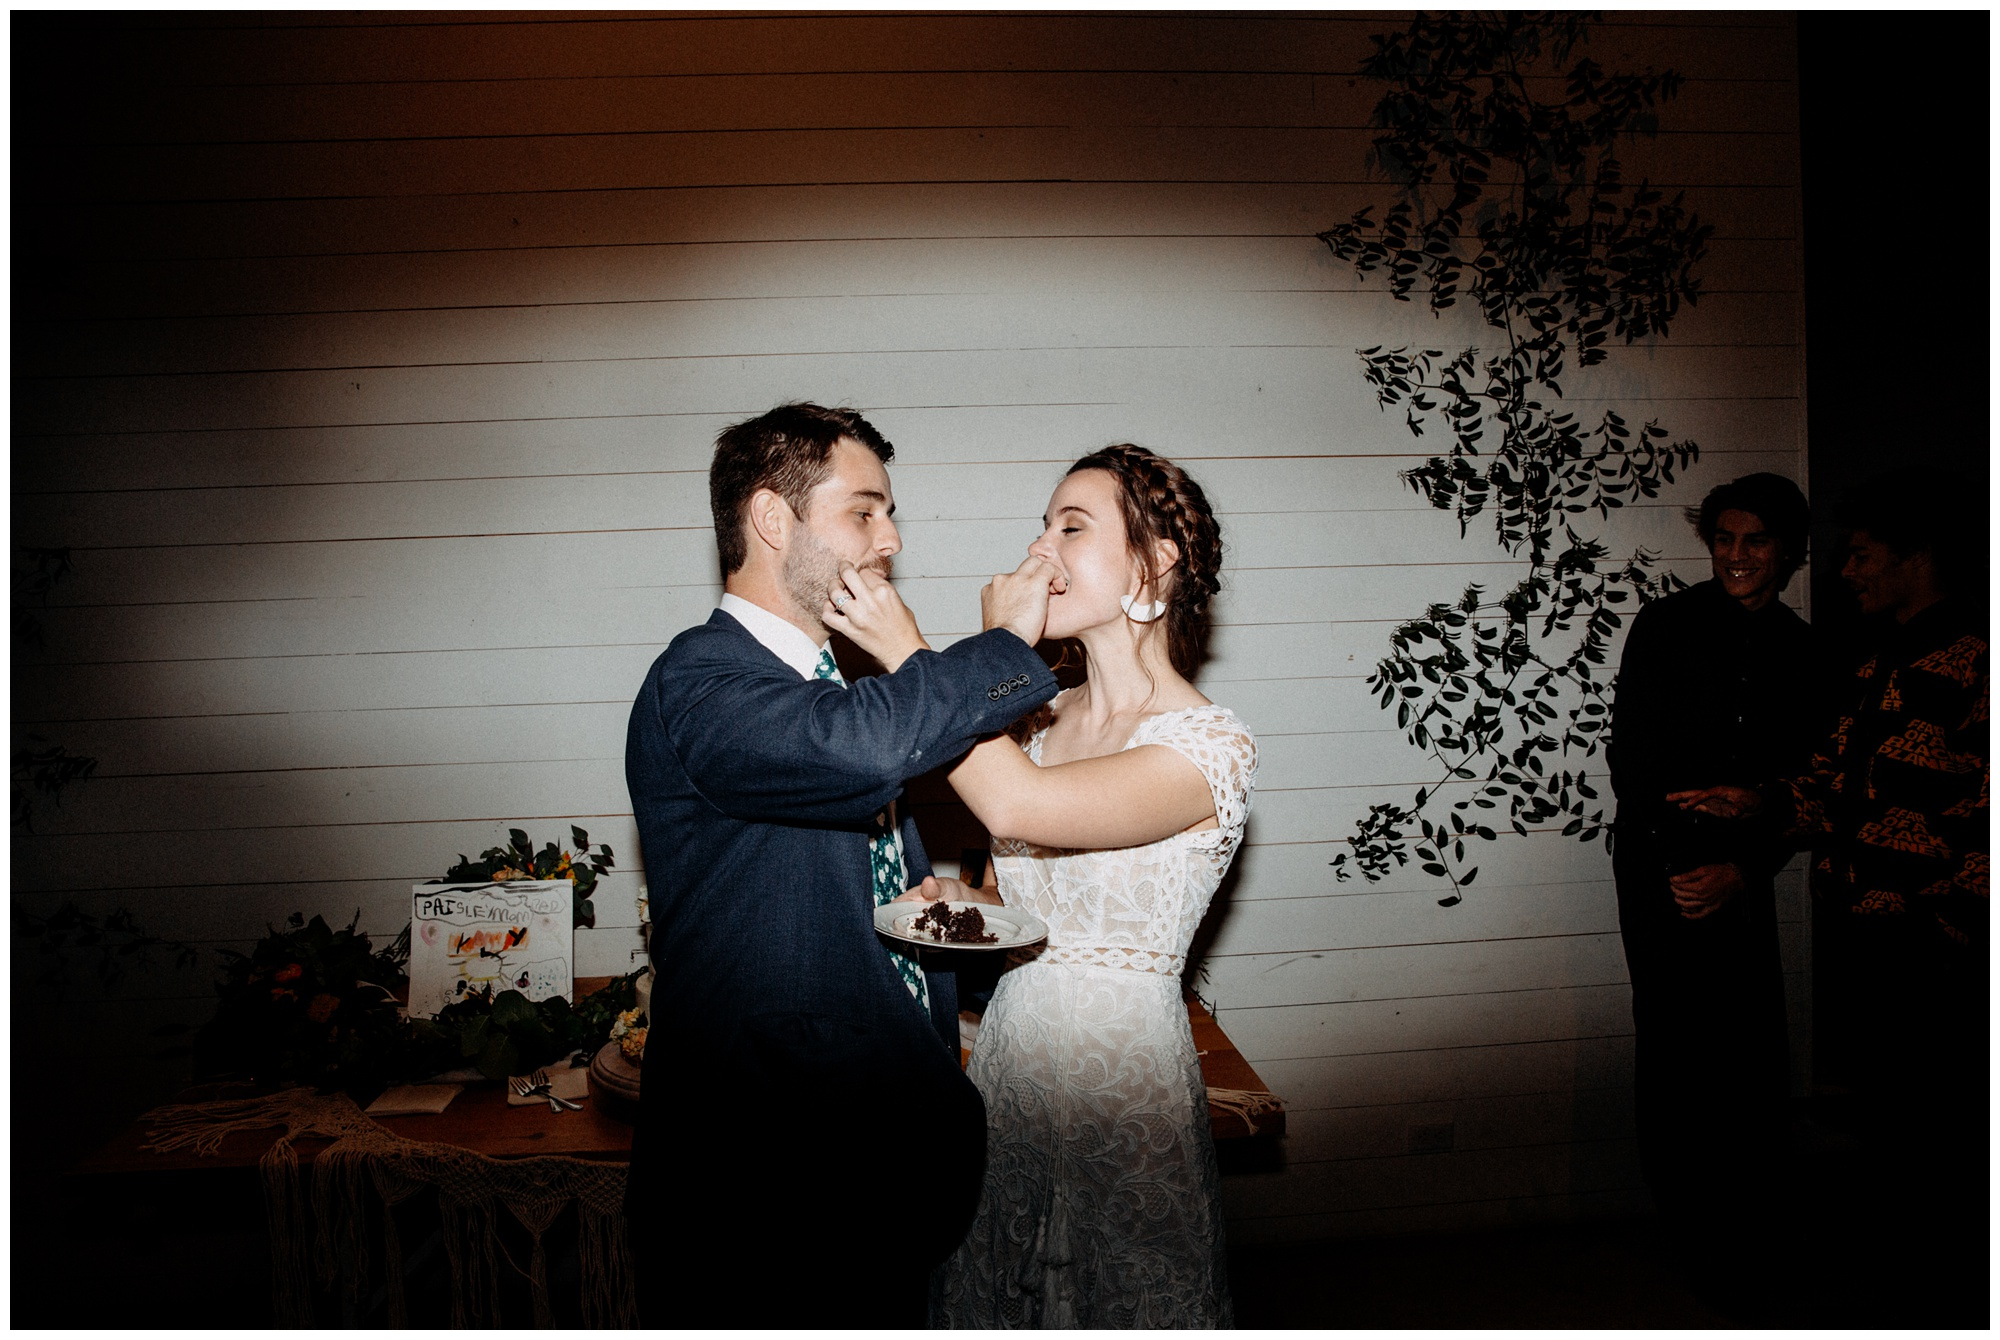 AUSTIN-TEXAS-PROSPECT-HOUSE-WEDDING-VENUE-PHOTOGRAPHY25851.JPG